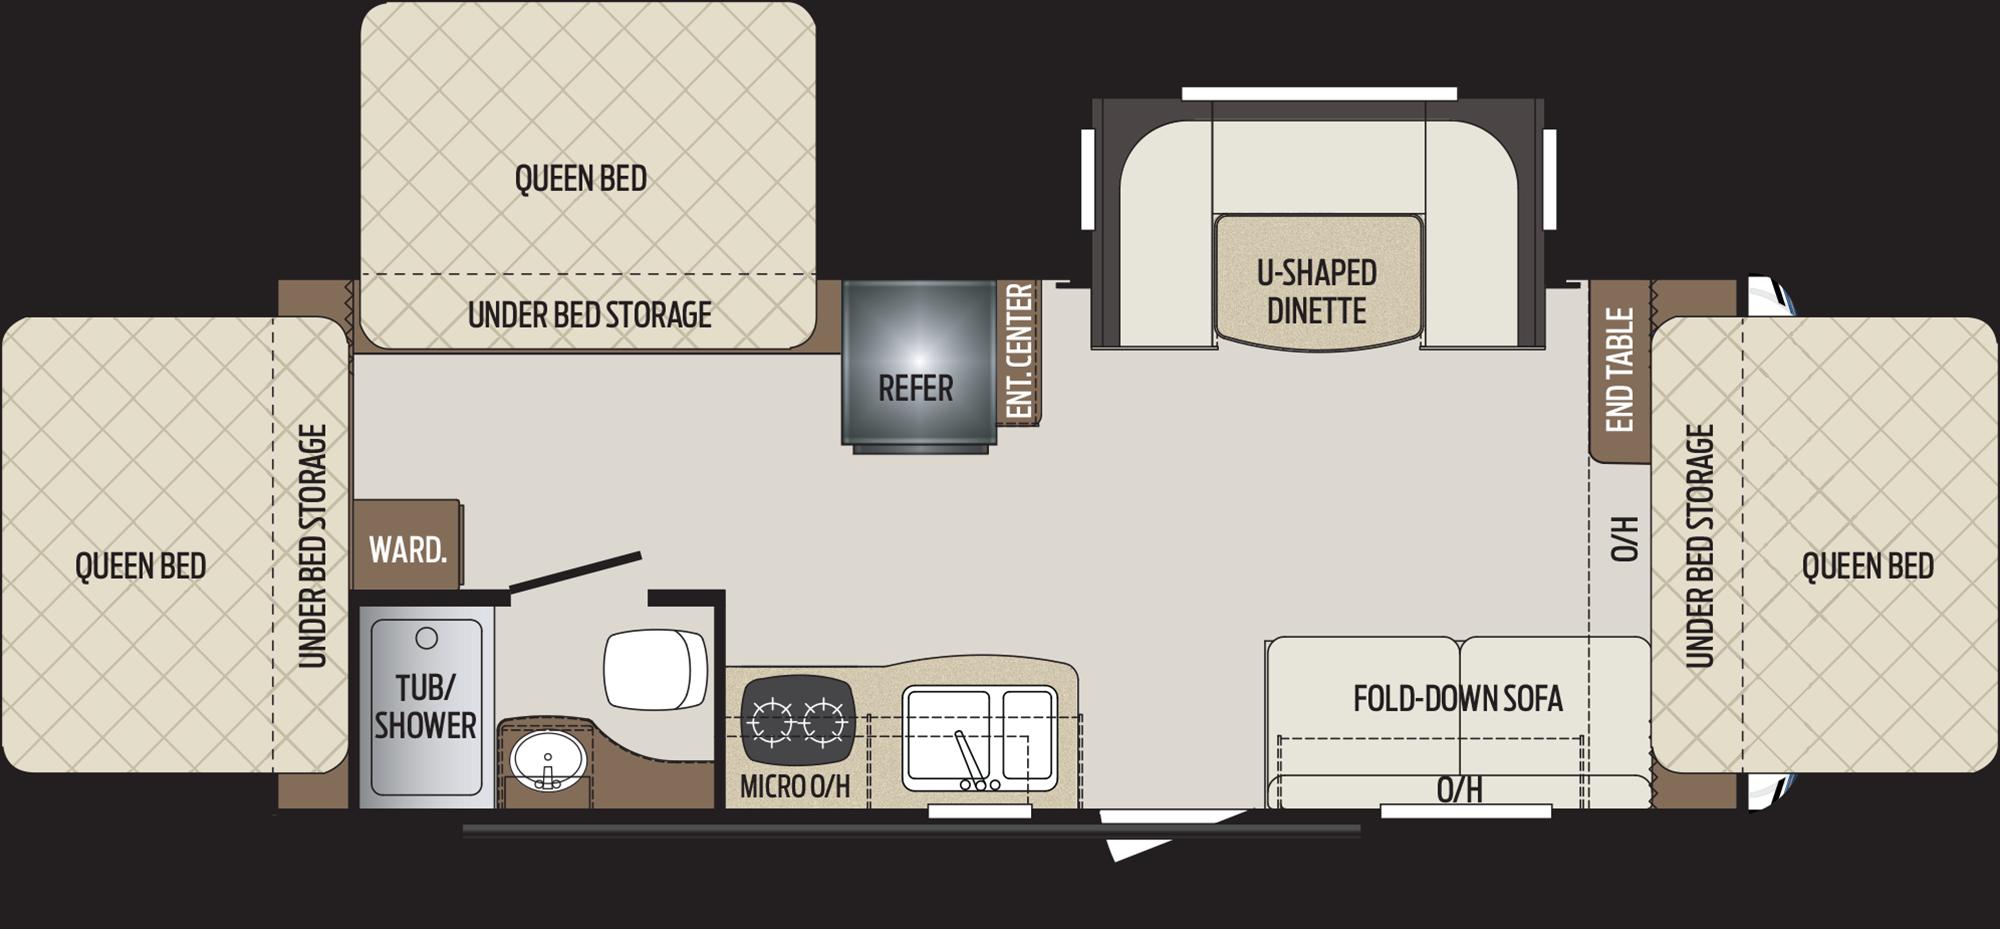 2019 KEYSTONE BULLET CROSSFIRE 2190EX (bunks) Floorplan